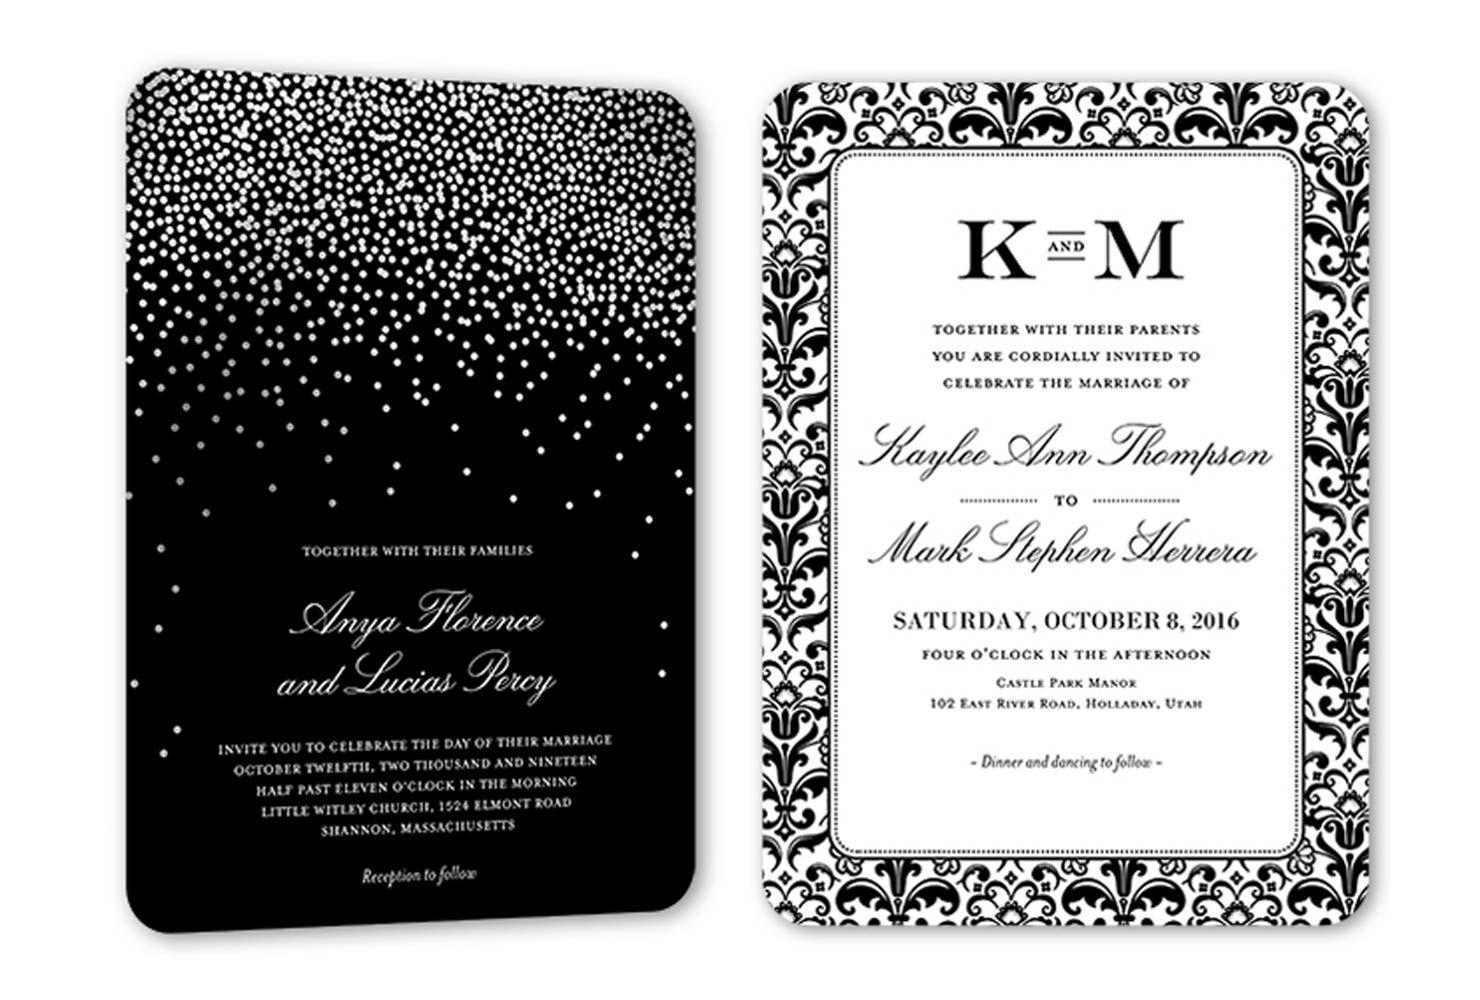 Wedding Invitation Wording Examples Wedding invitation